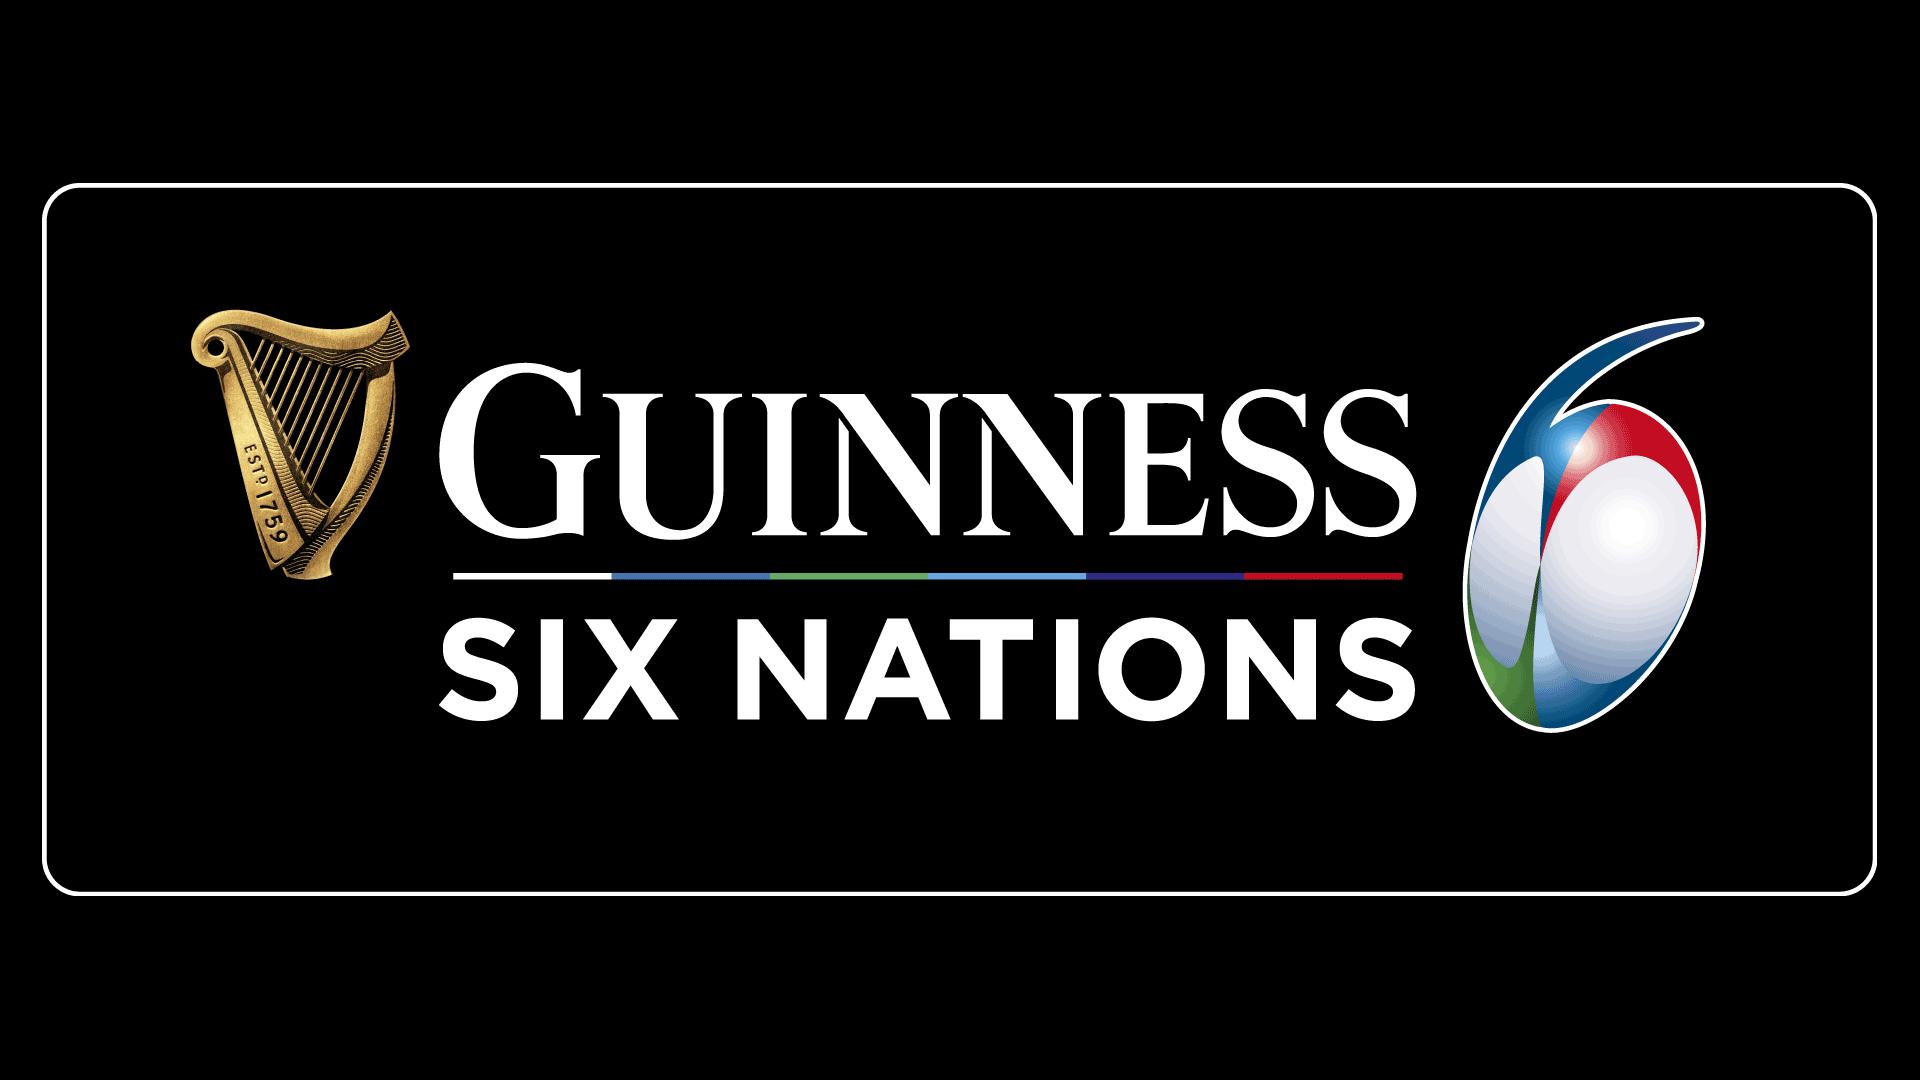 Six Nations Championship 2021: Full Schedule, Teams, Venues